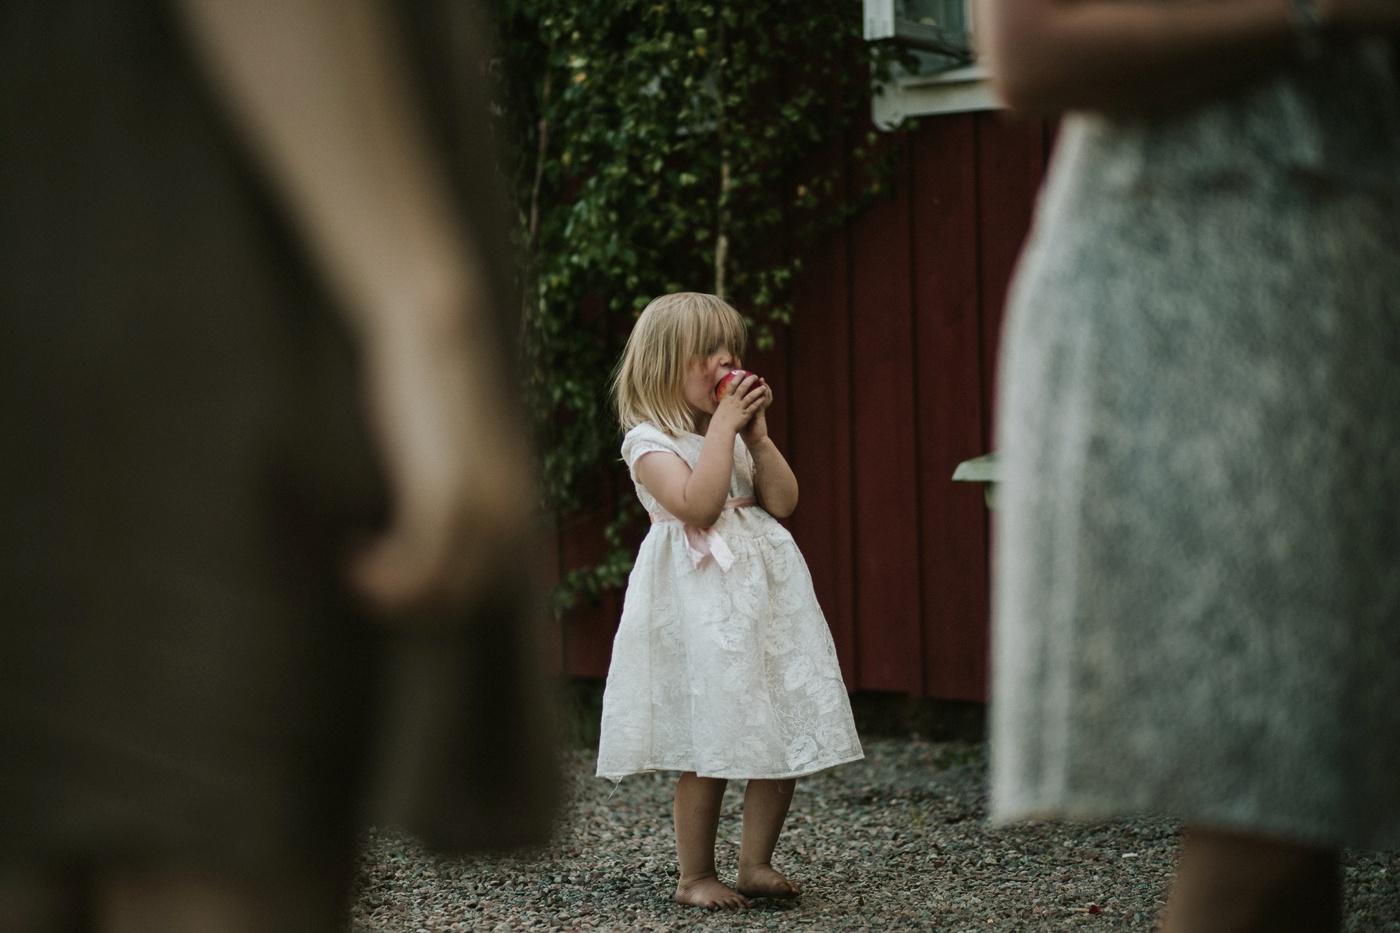 ceciliajoakim_sweden-countryside-summer-wedding_melbourne-fun-quirky-wedding-photography_73